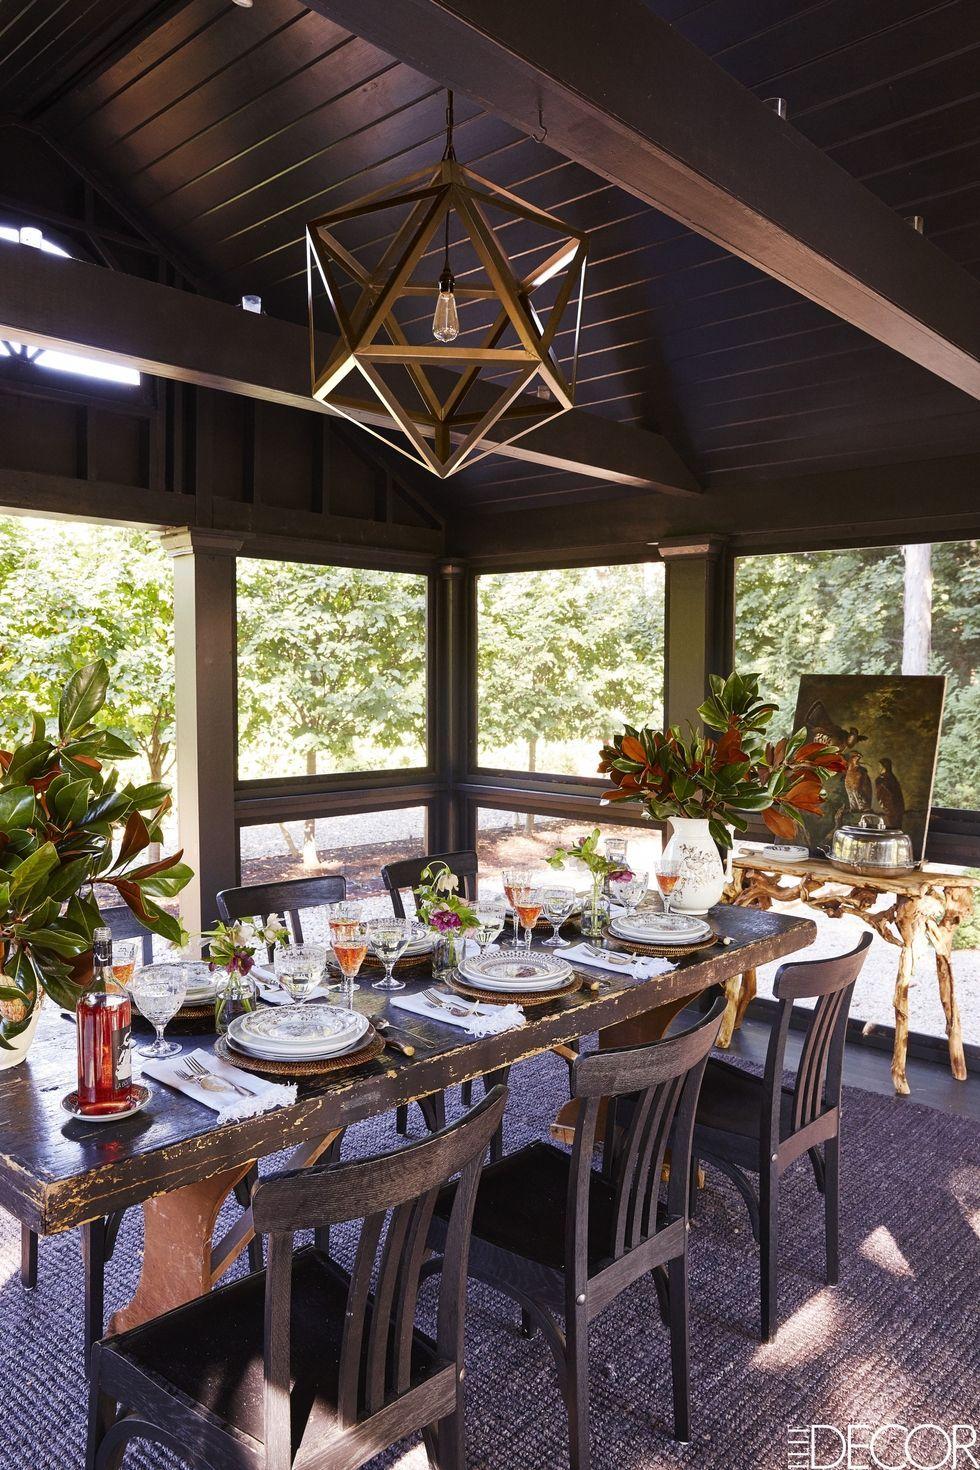 40 Best Small Patio Ideas - Small Patio Furniture & Design on Small Patio Design Ideas  id=15902